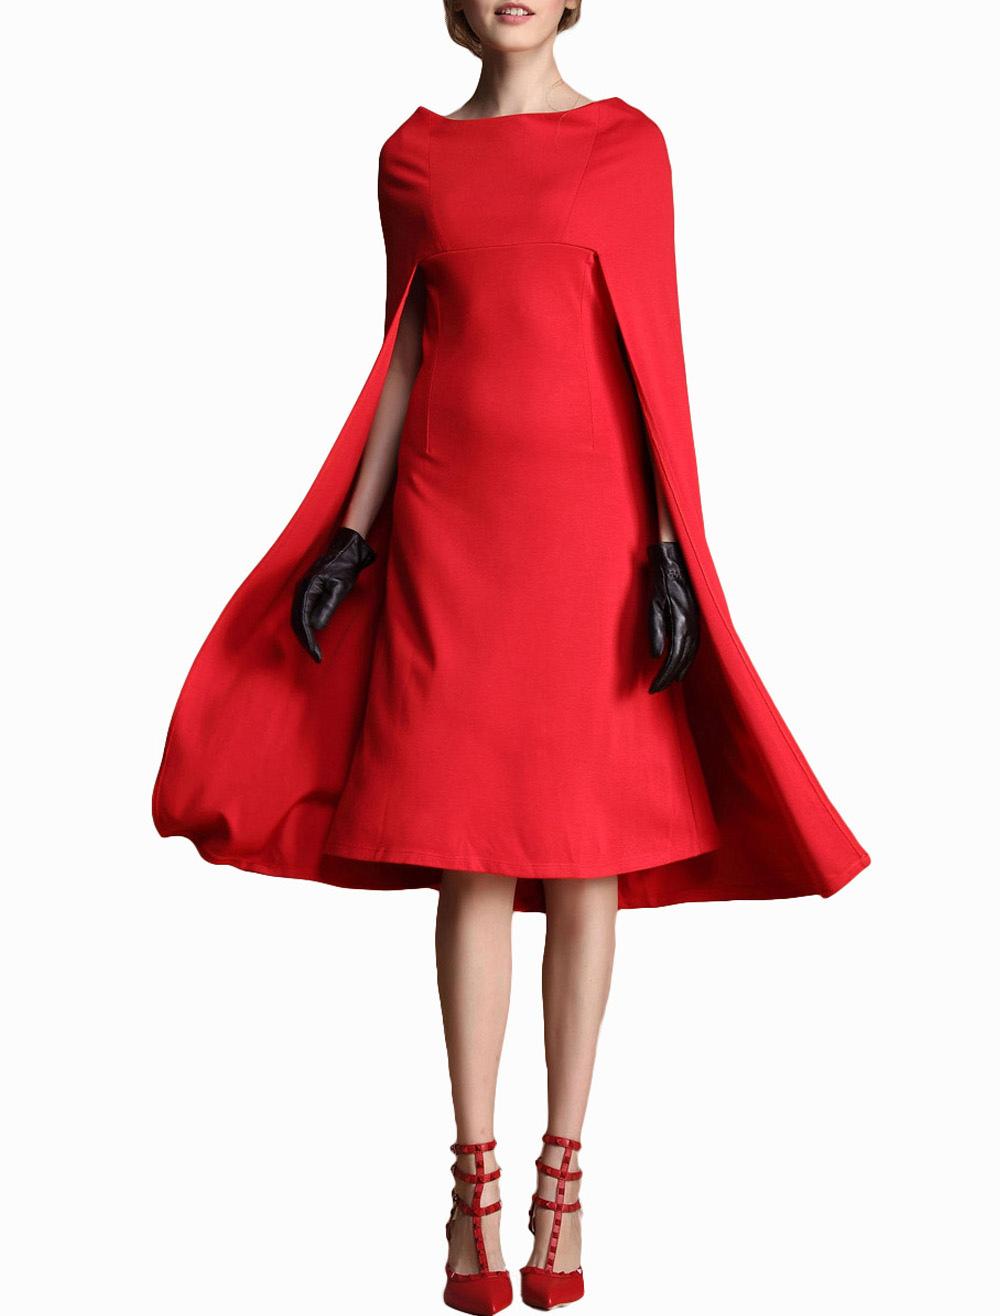 1a5e269466 Women Dress Red Cape Poncho Bodycon Midi Dress - Milanoo.com